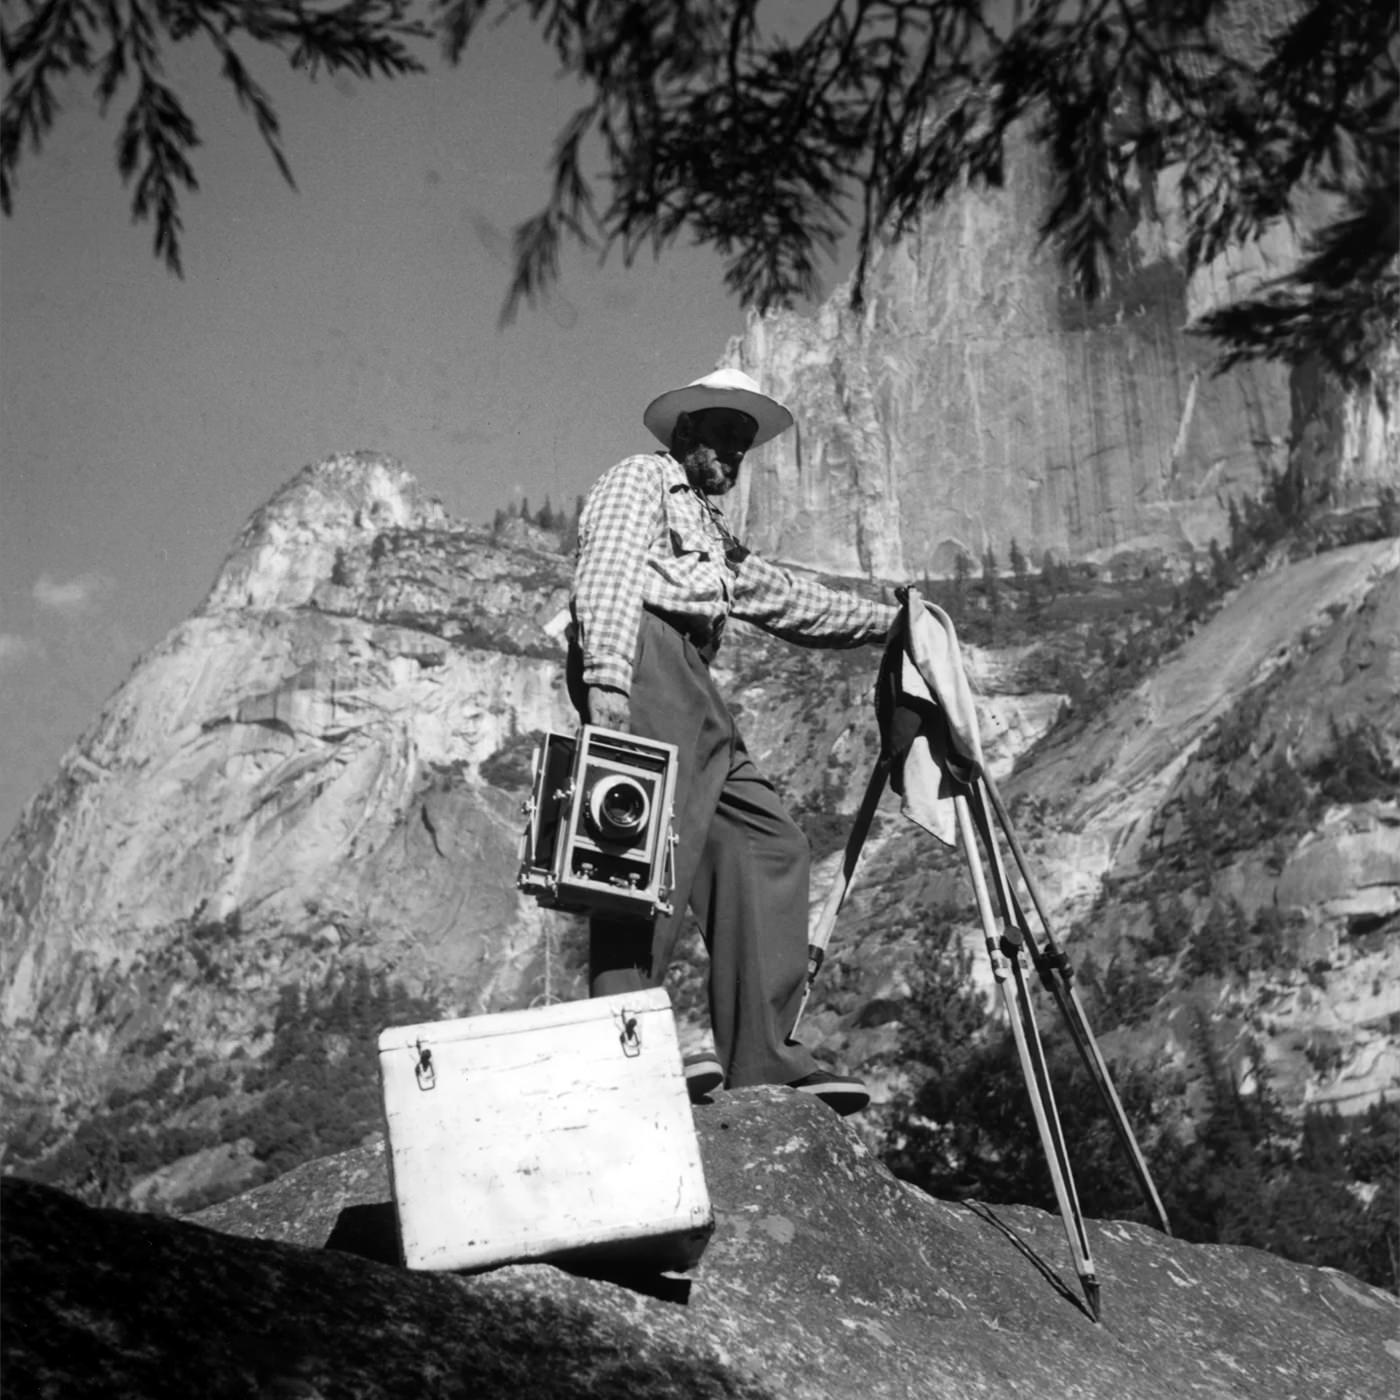 Imogen Cunningham Ansel Adams Photographing Yosemite 1953